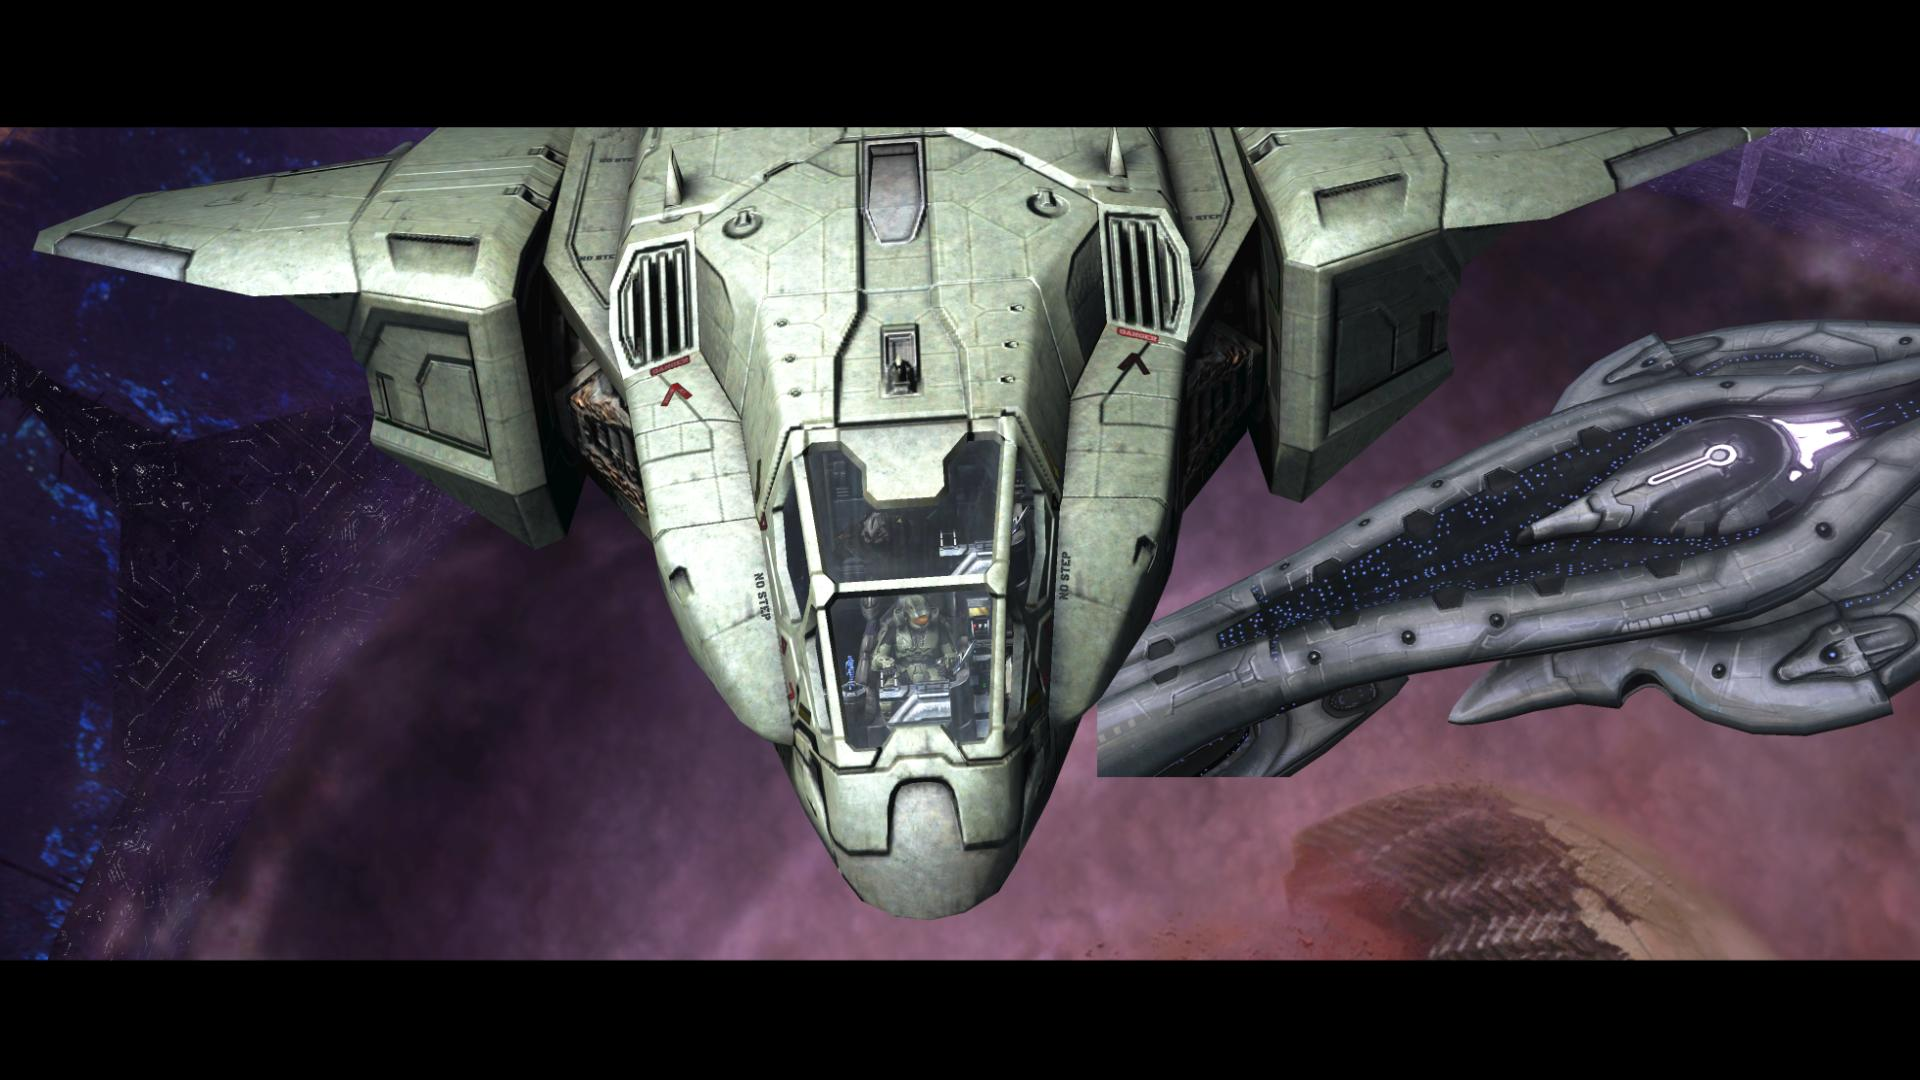 1522694289 34eda766c1 o Halo 3: Scene